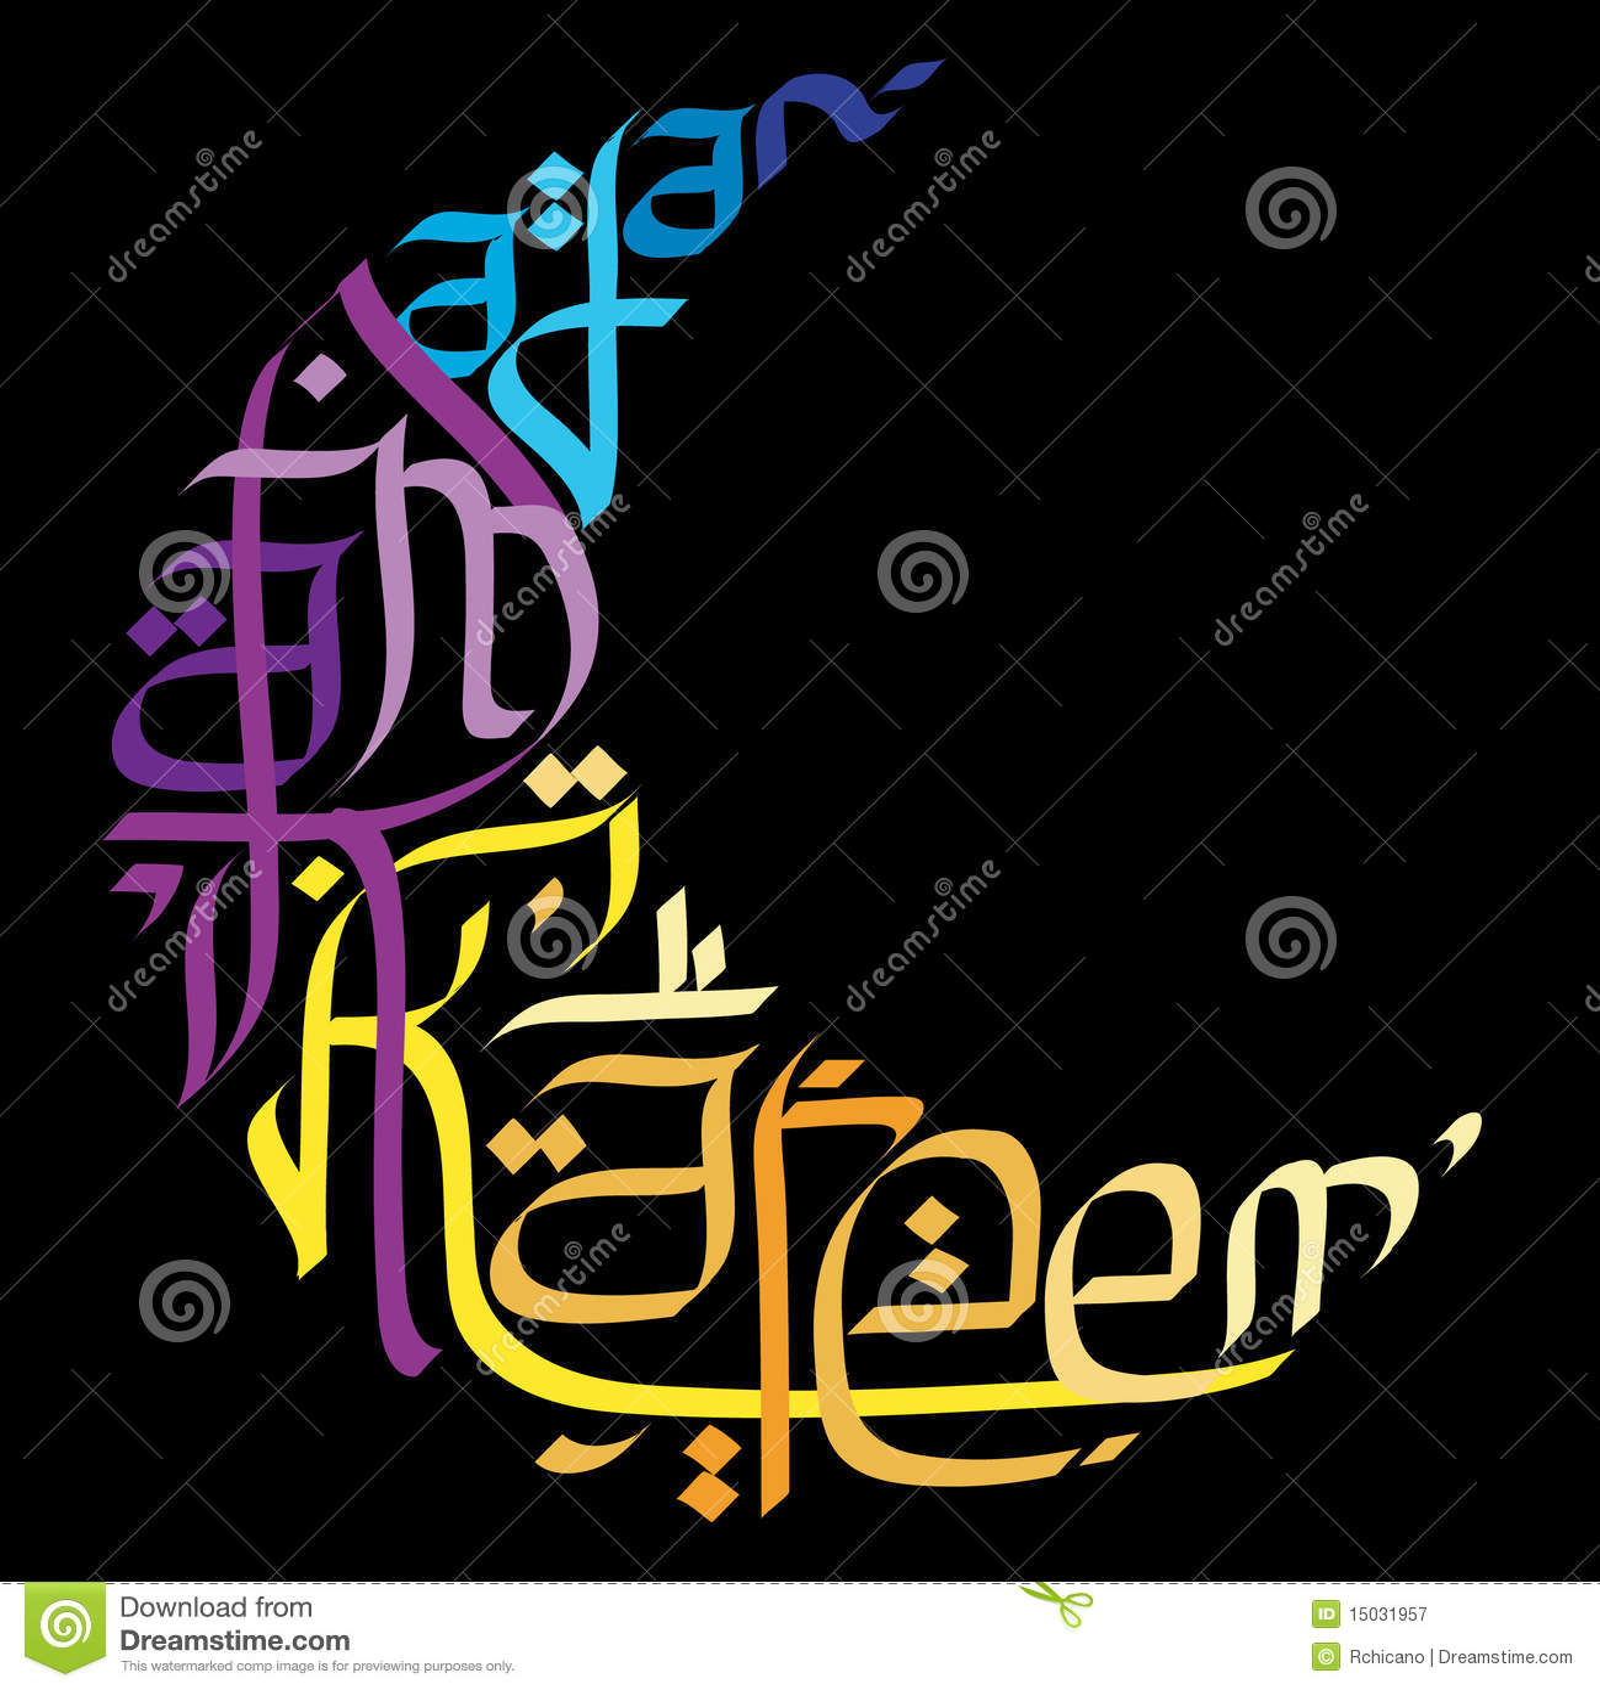 Ramadan Greetings In English Calligraphy Stock Vector Illustration